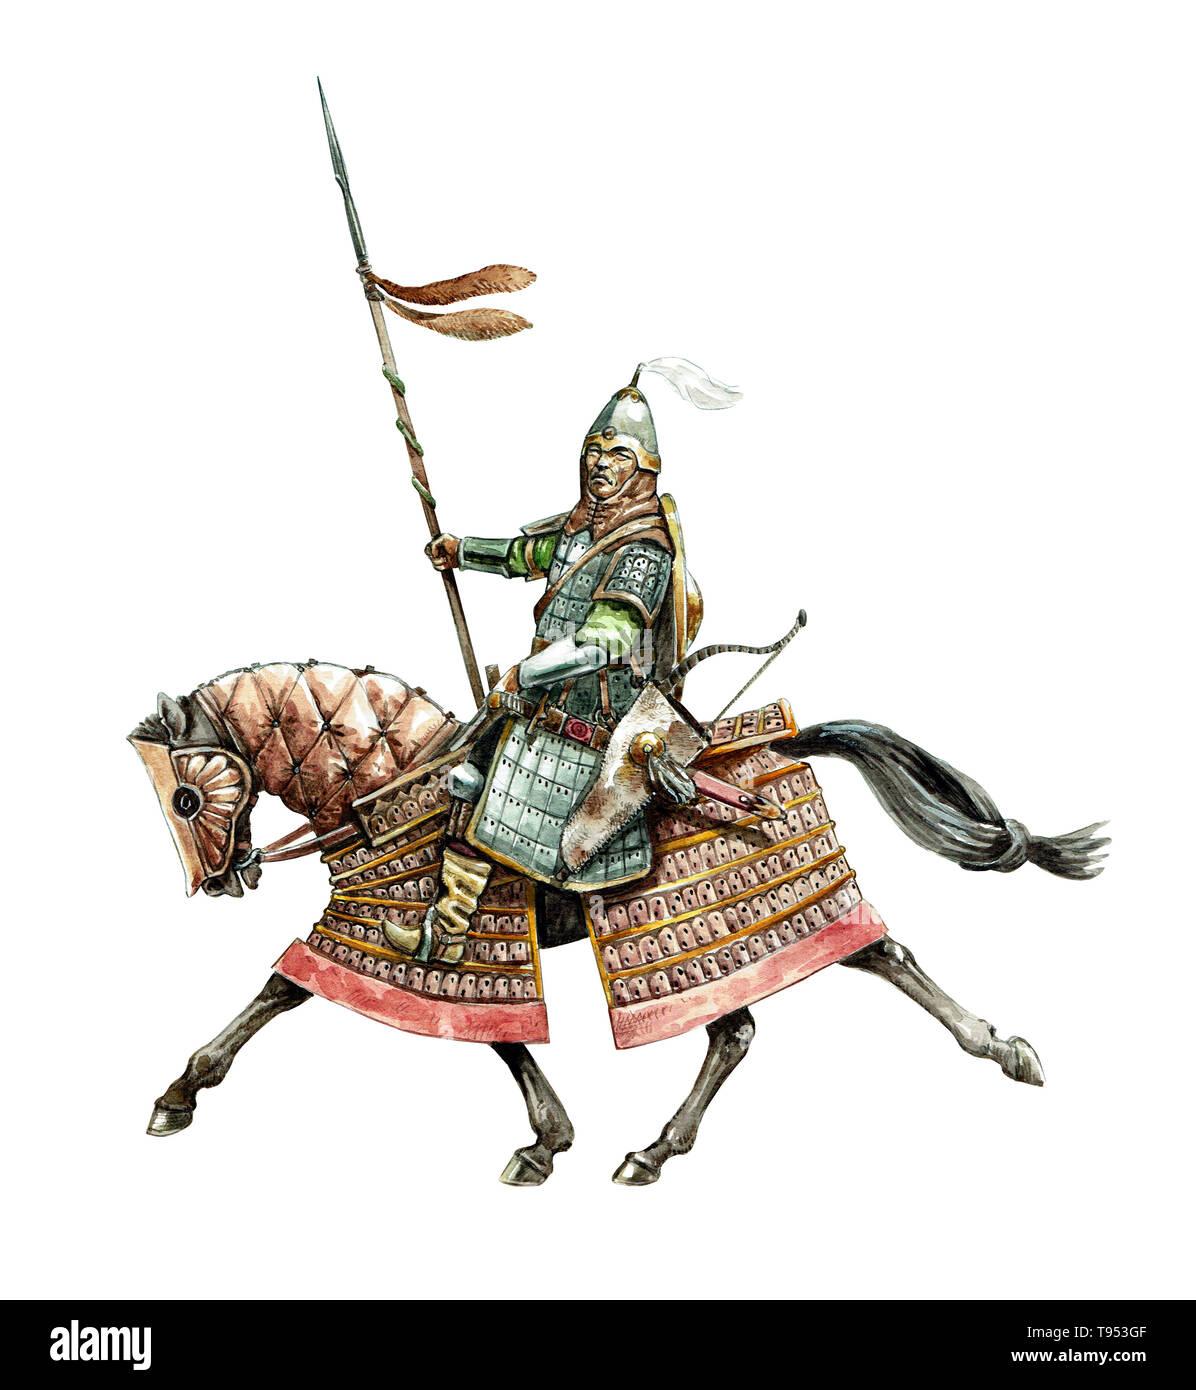 Mongol warrior. Medieval cavalry illustration. Historical illustration. - Stock Image